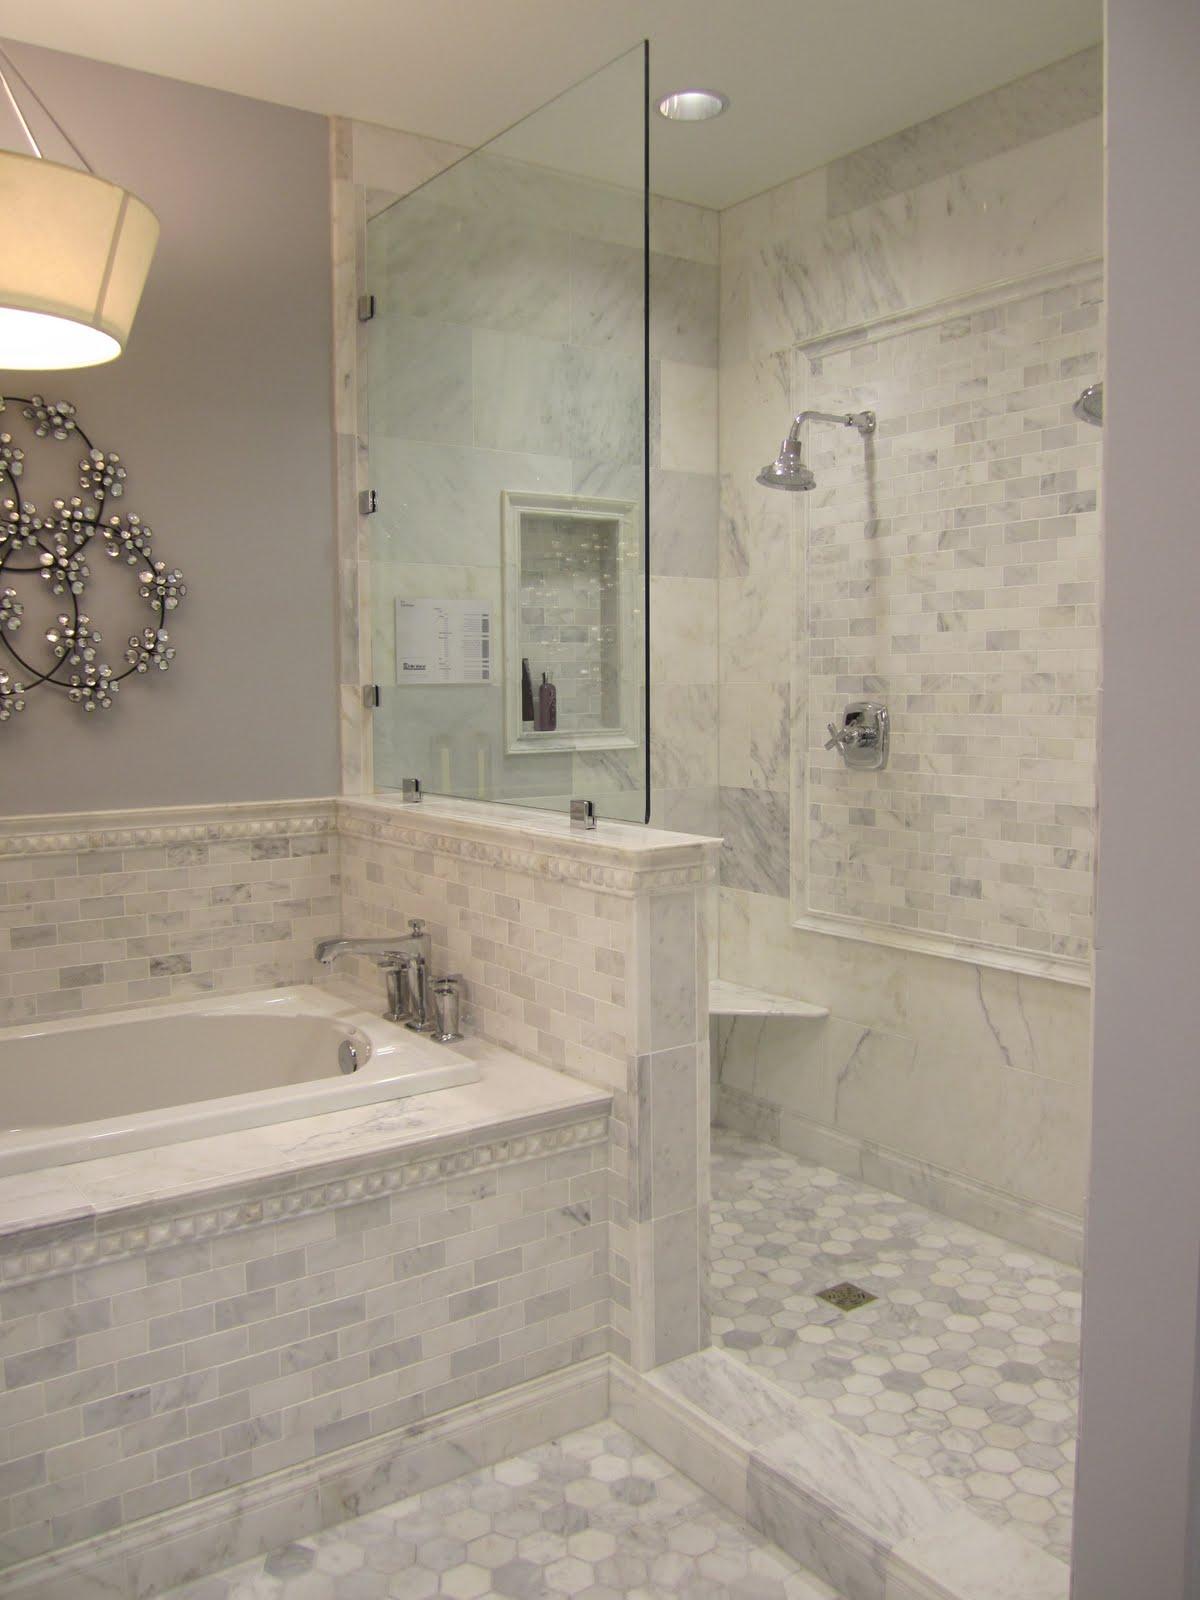 The Tile Shop Design By Kirsty - Carrara gris porcelain tile